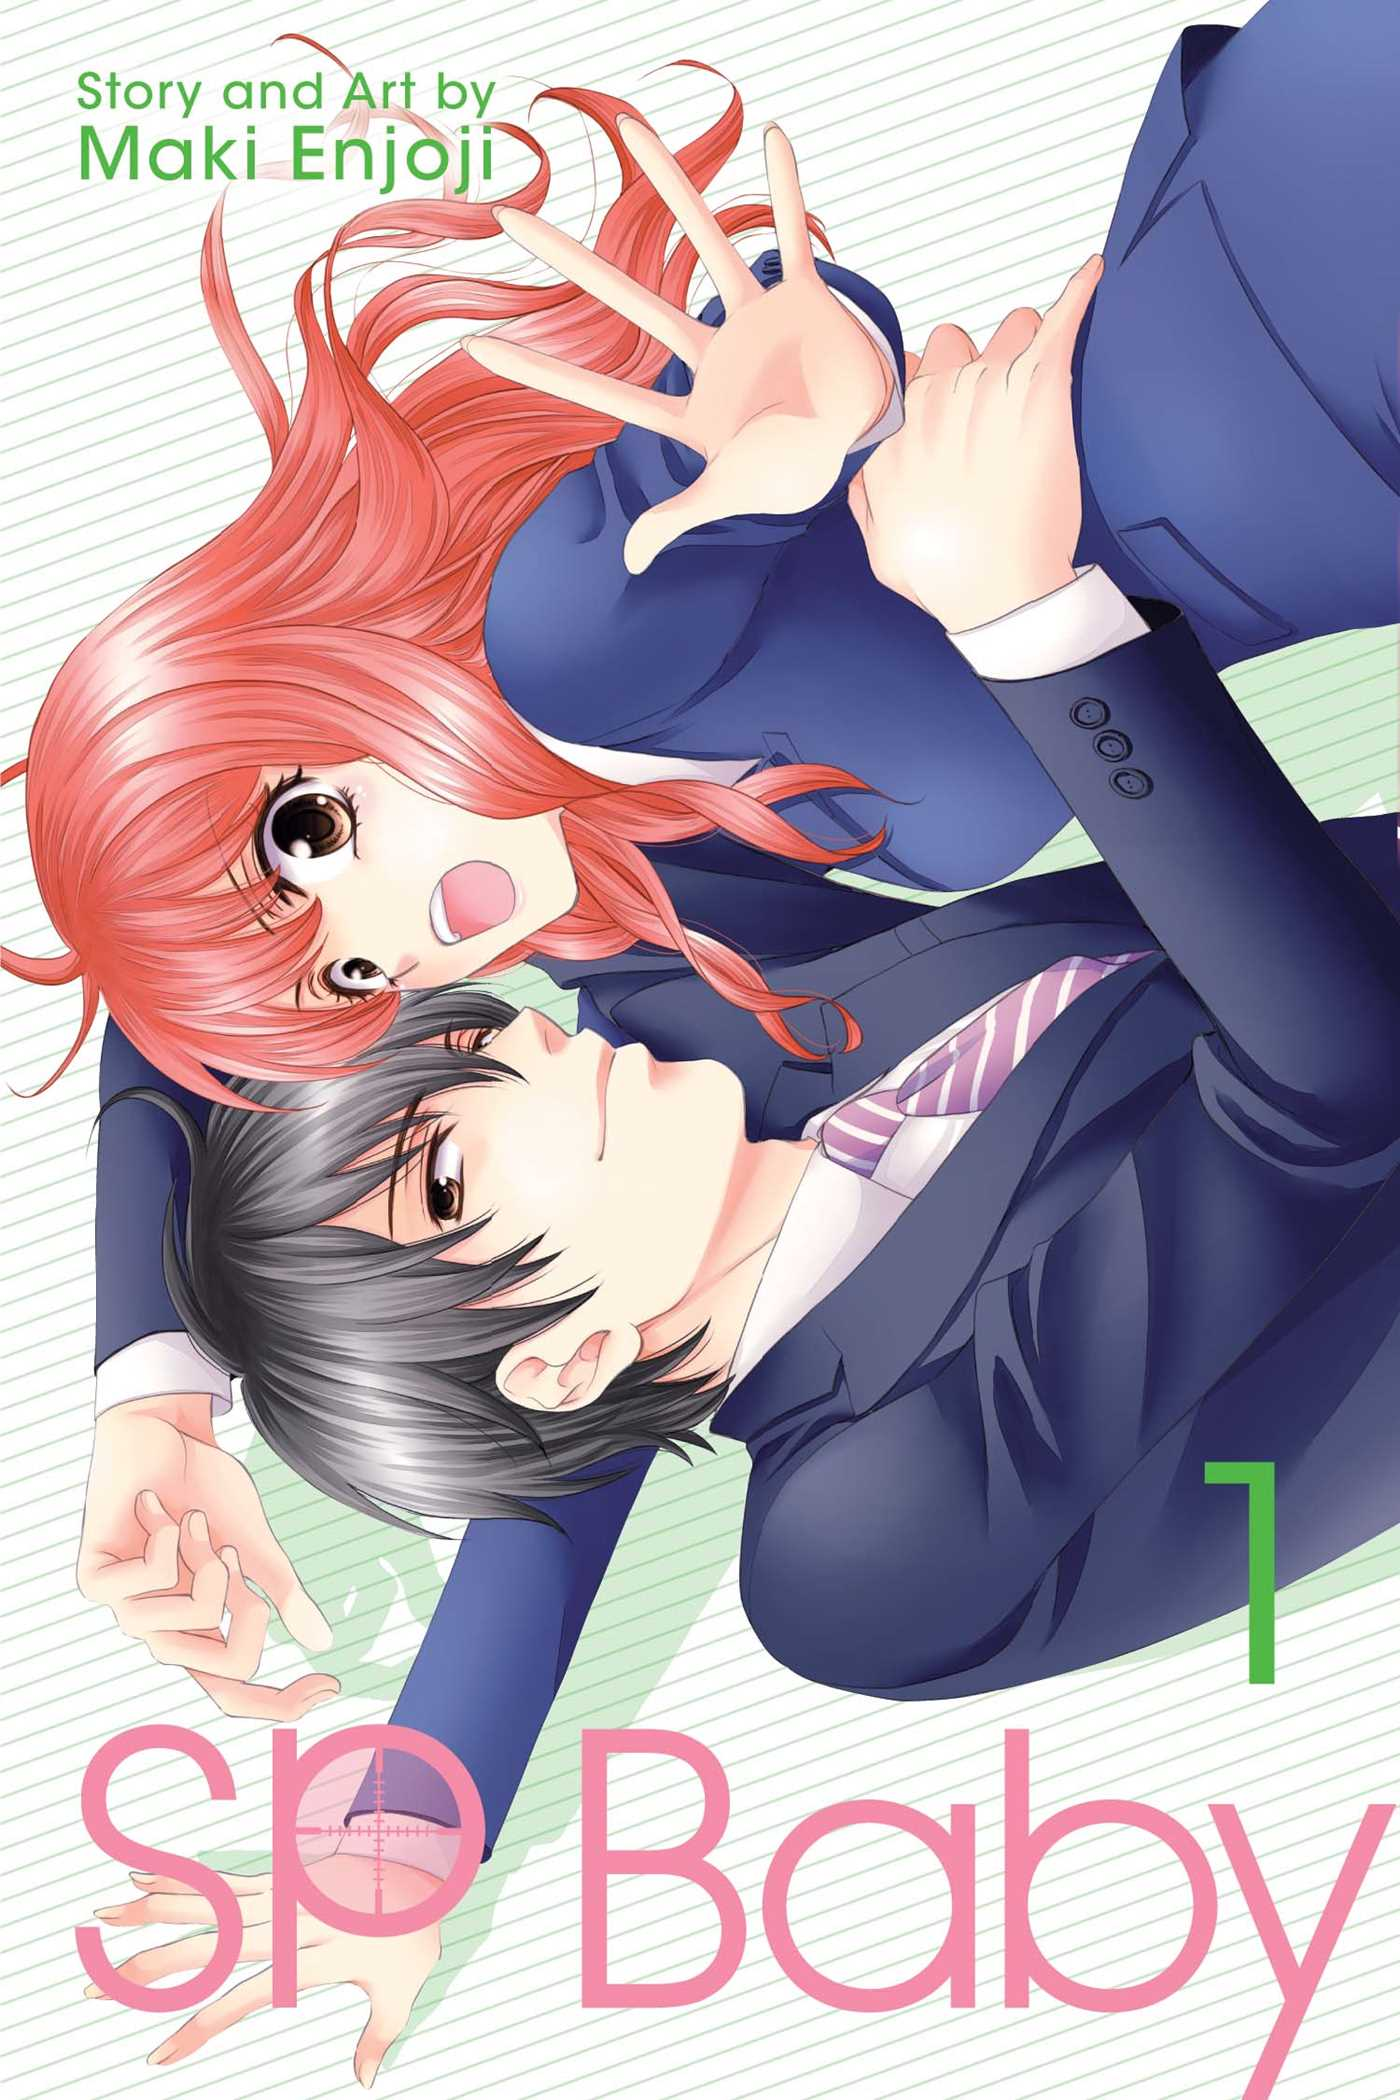 SP Baby Manga Cover.jpg